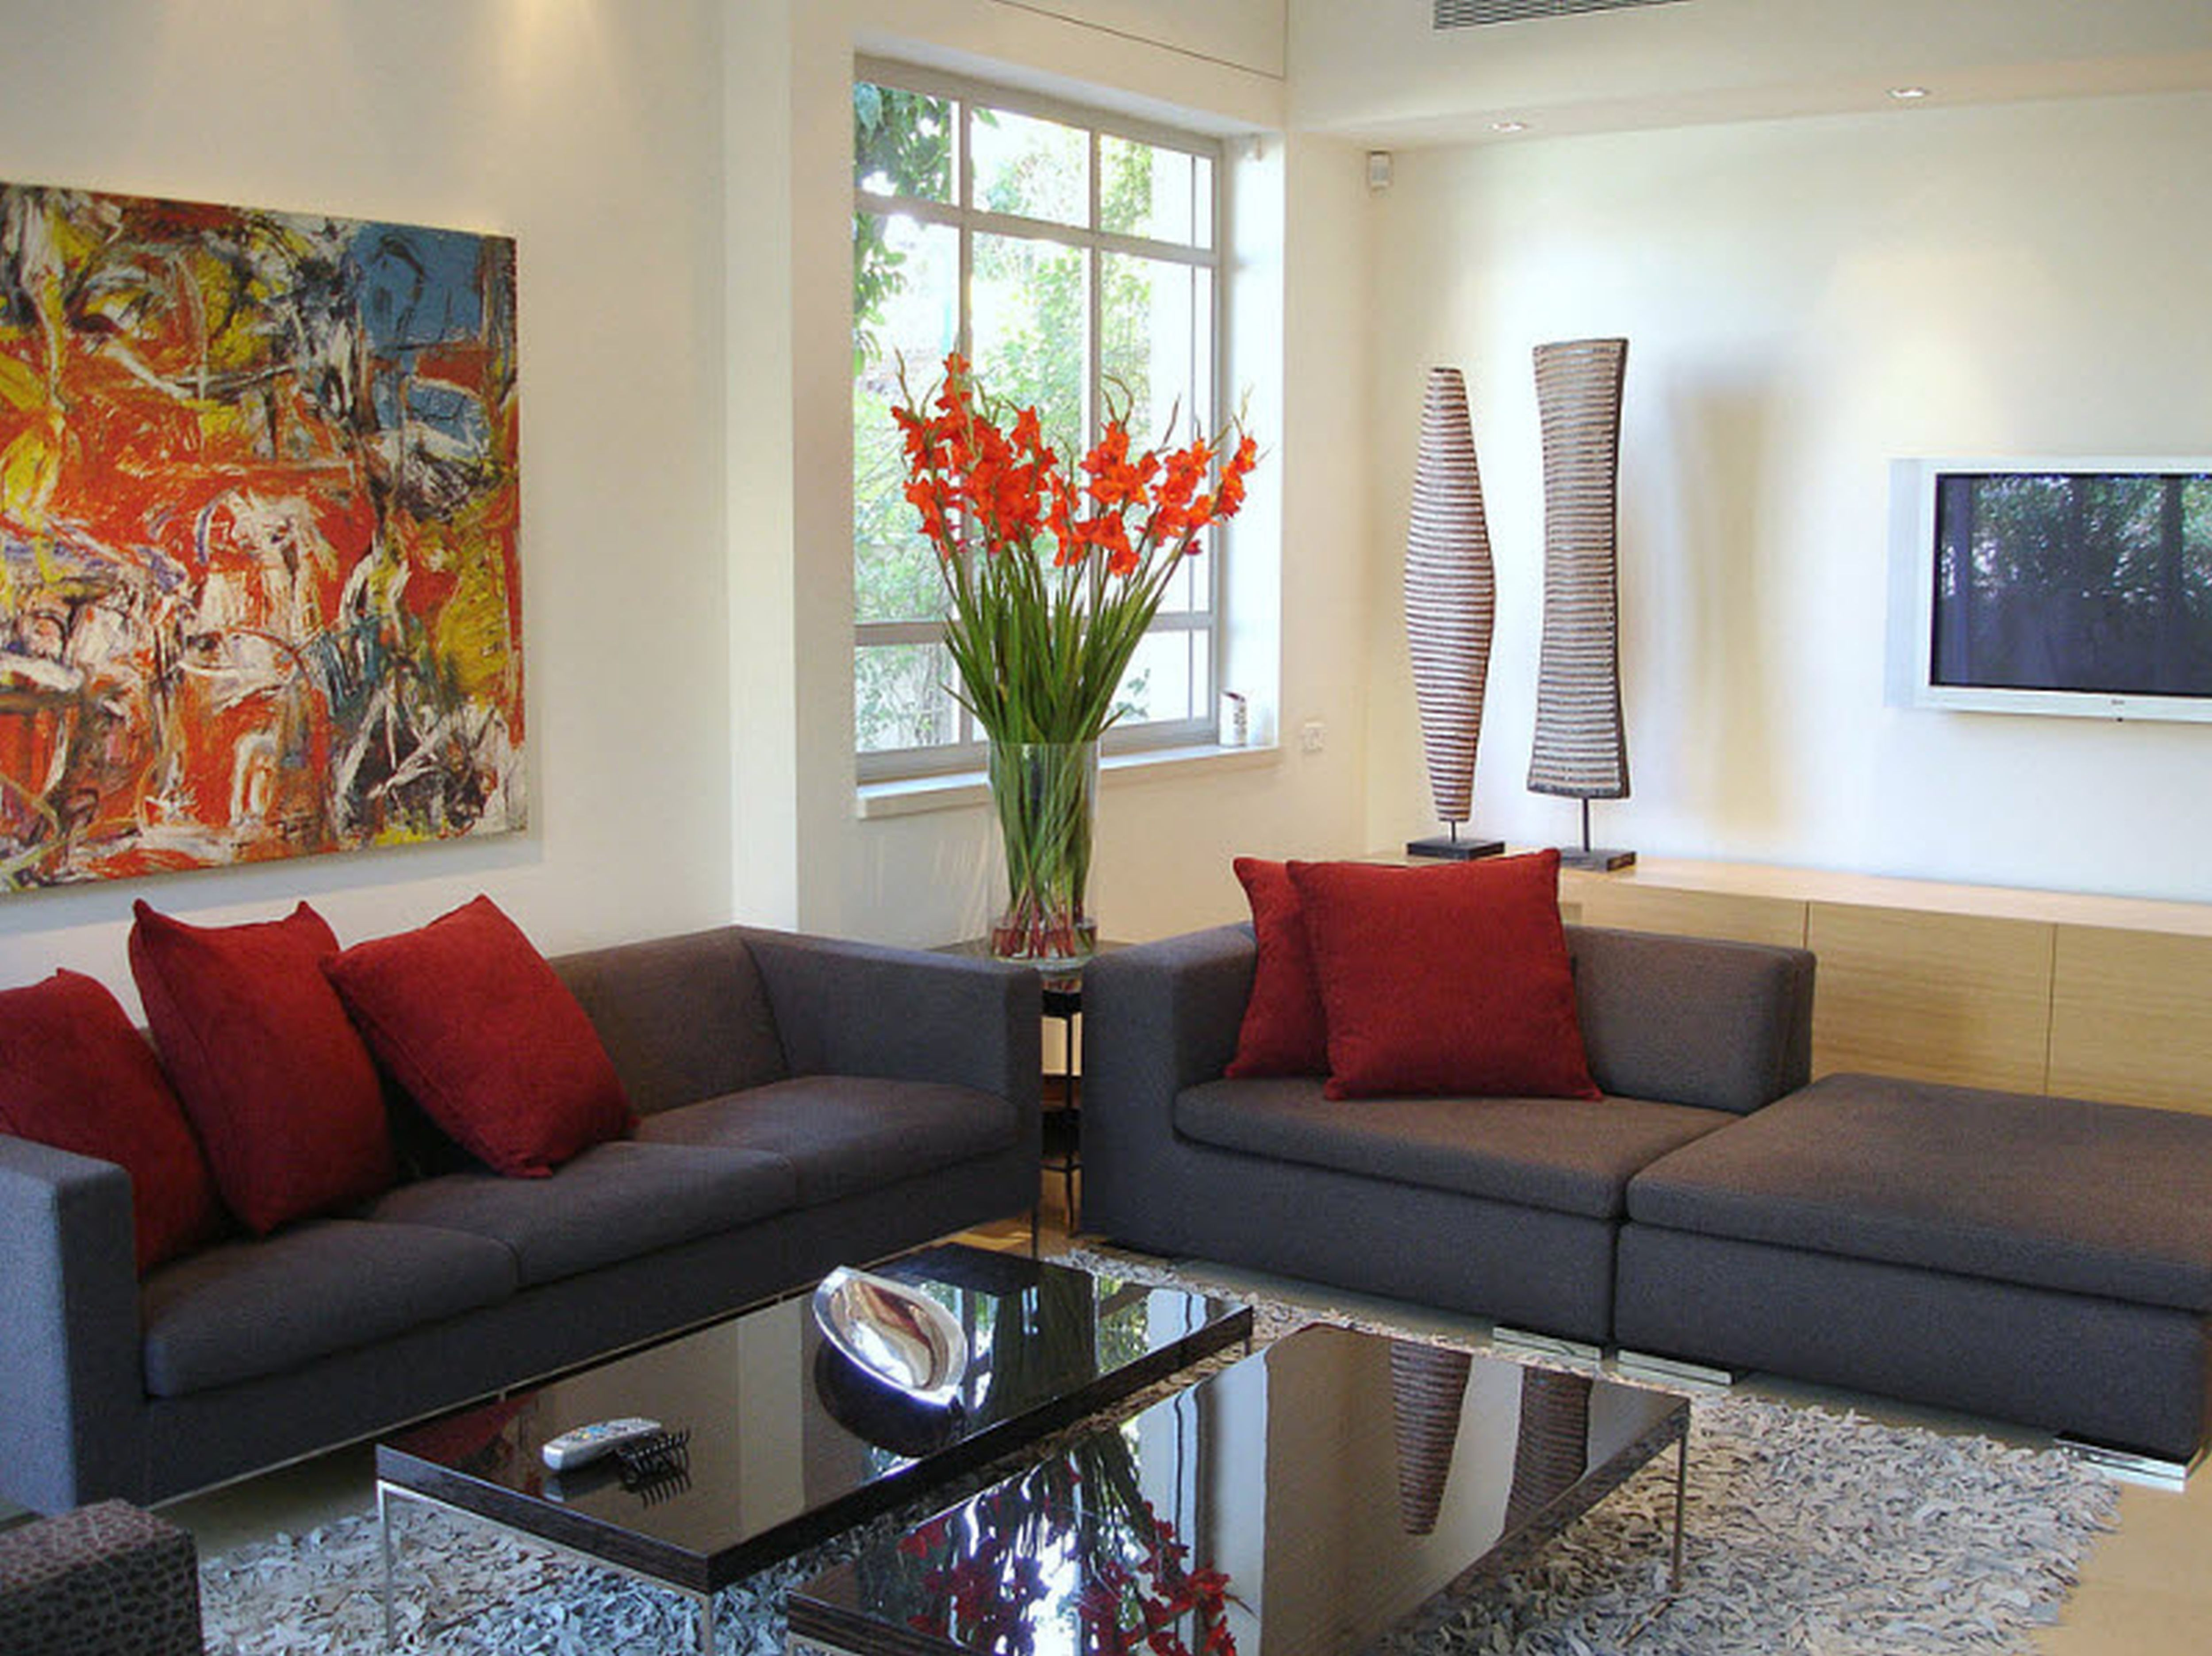 Small L Shaped Living Room Design Ideas  Euskal  Home Decor Cool L Shaped Living Room Designs Decorating Design